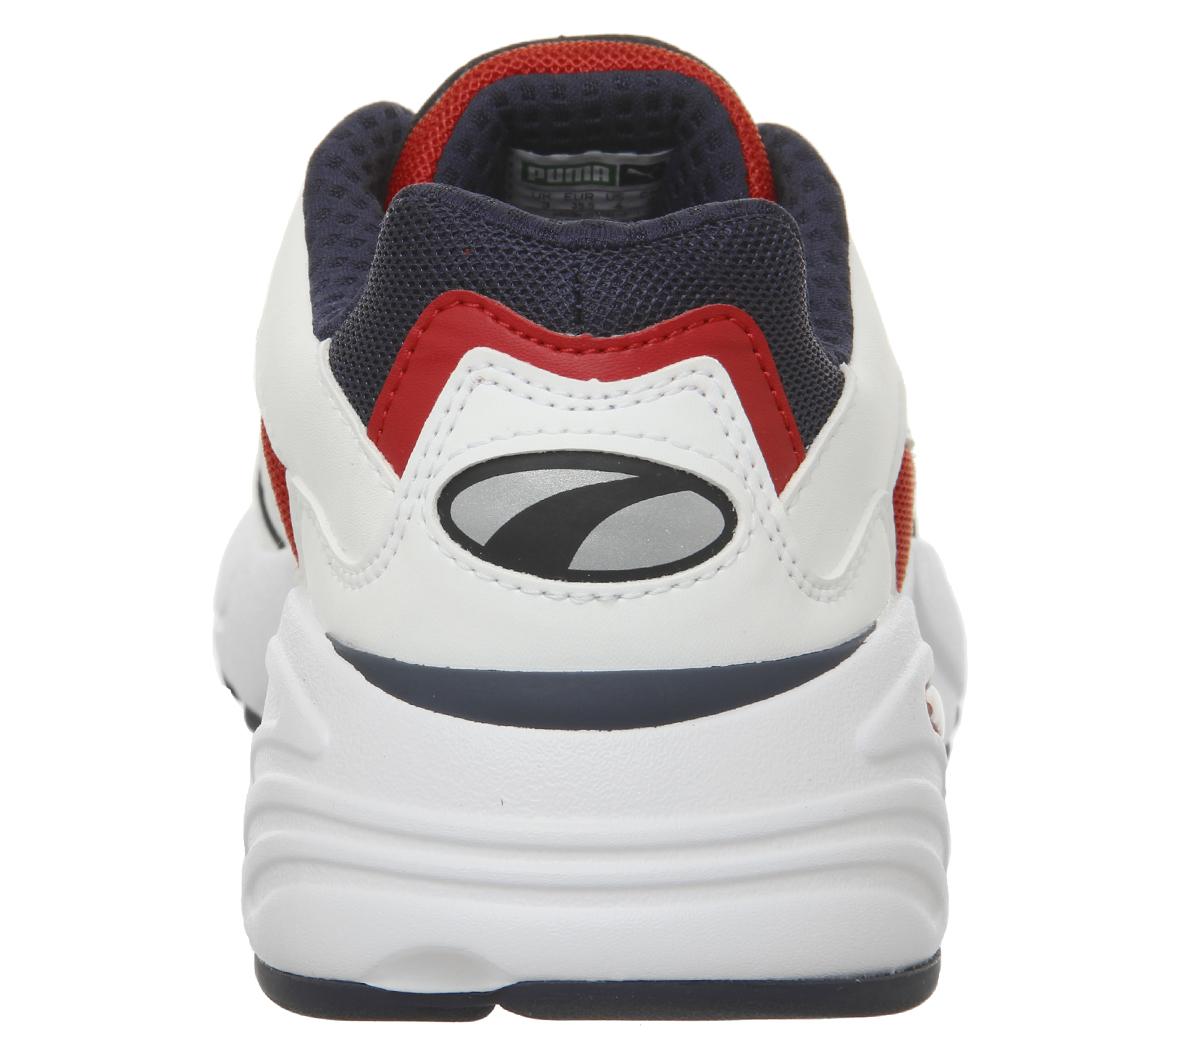 Homme-Puma-Cell-Viper-Baskets-PUMA-blanc-Risque-Eleve-Rouge-Baskets miniature 6